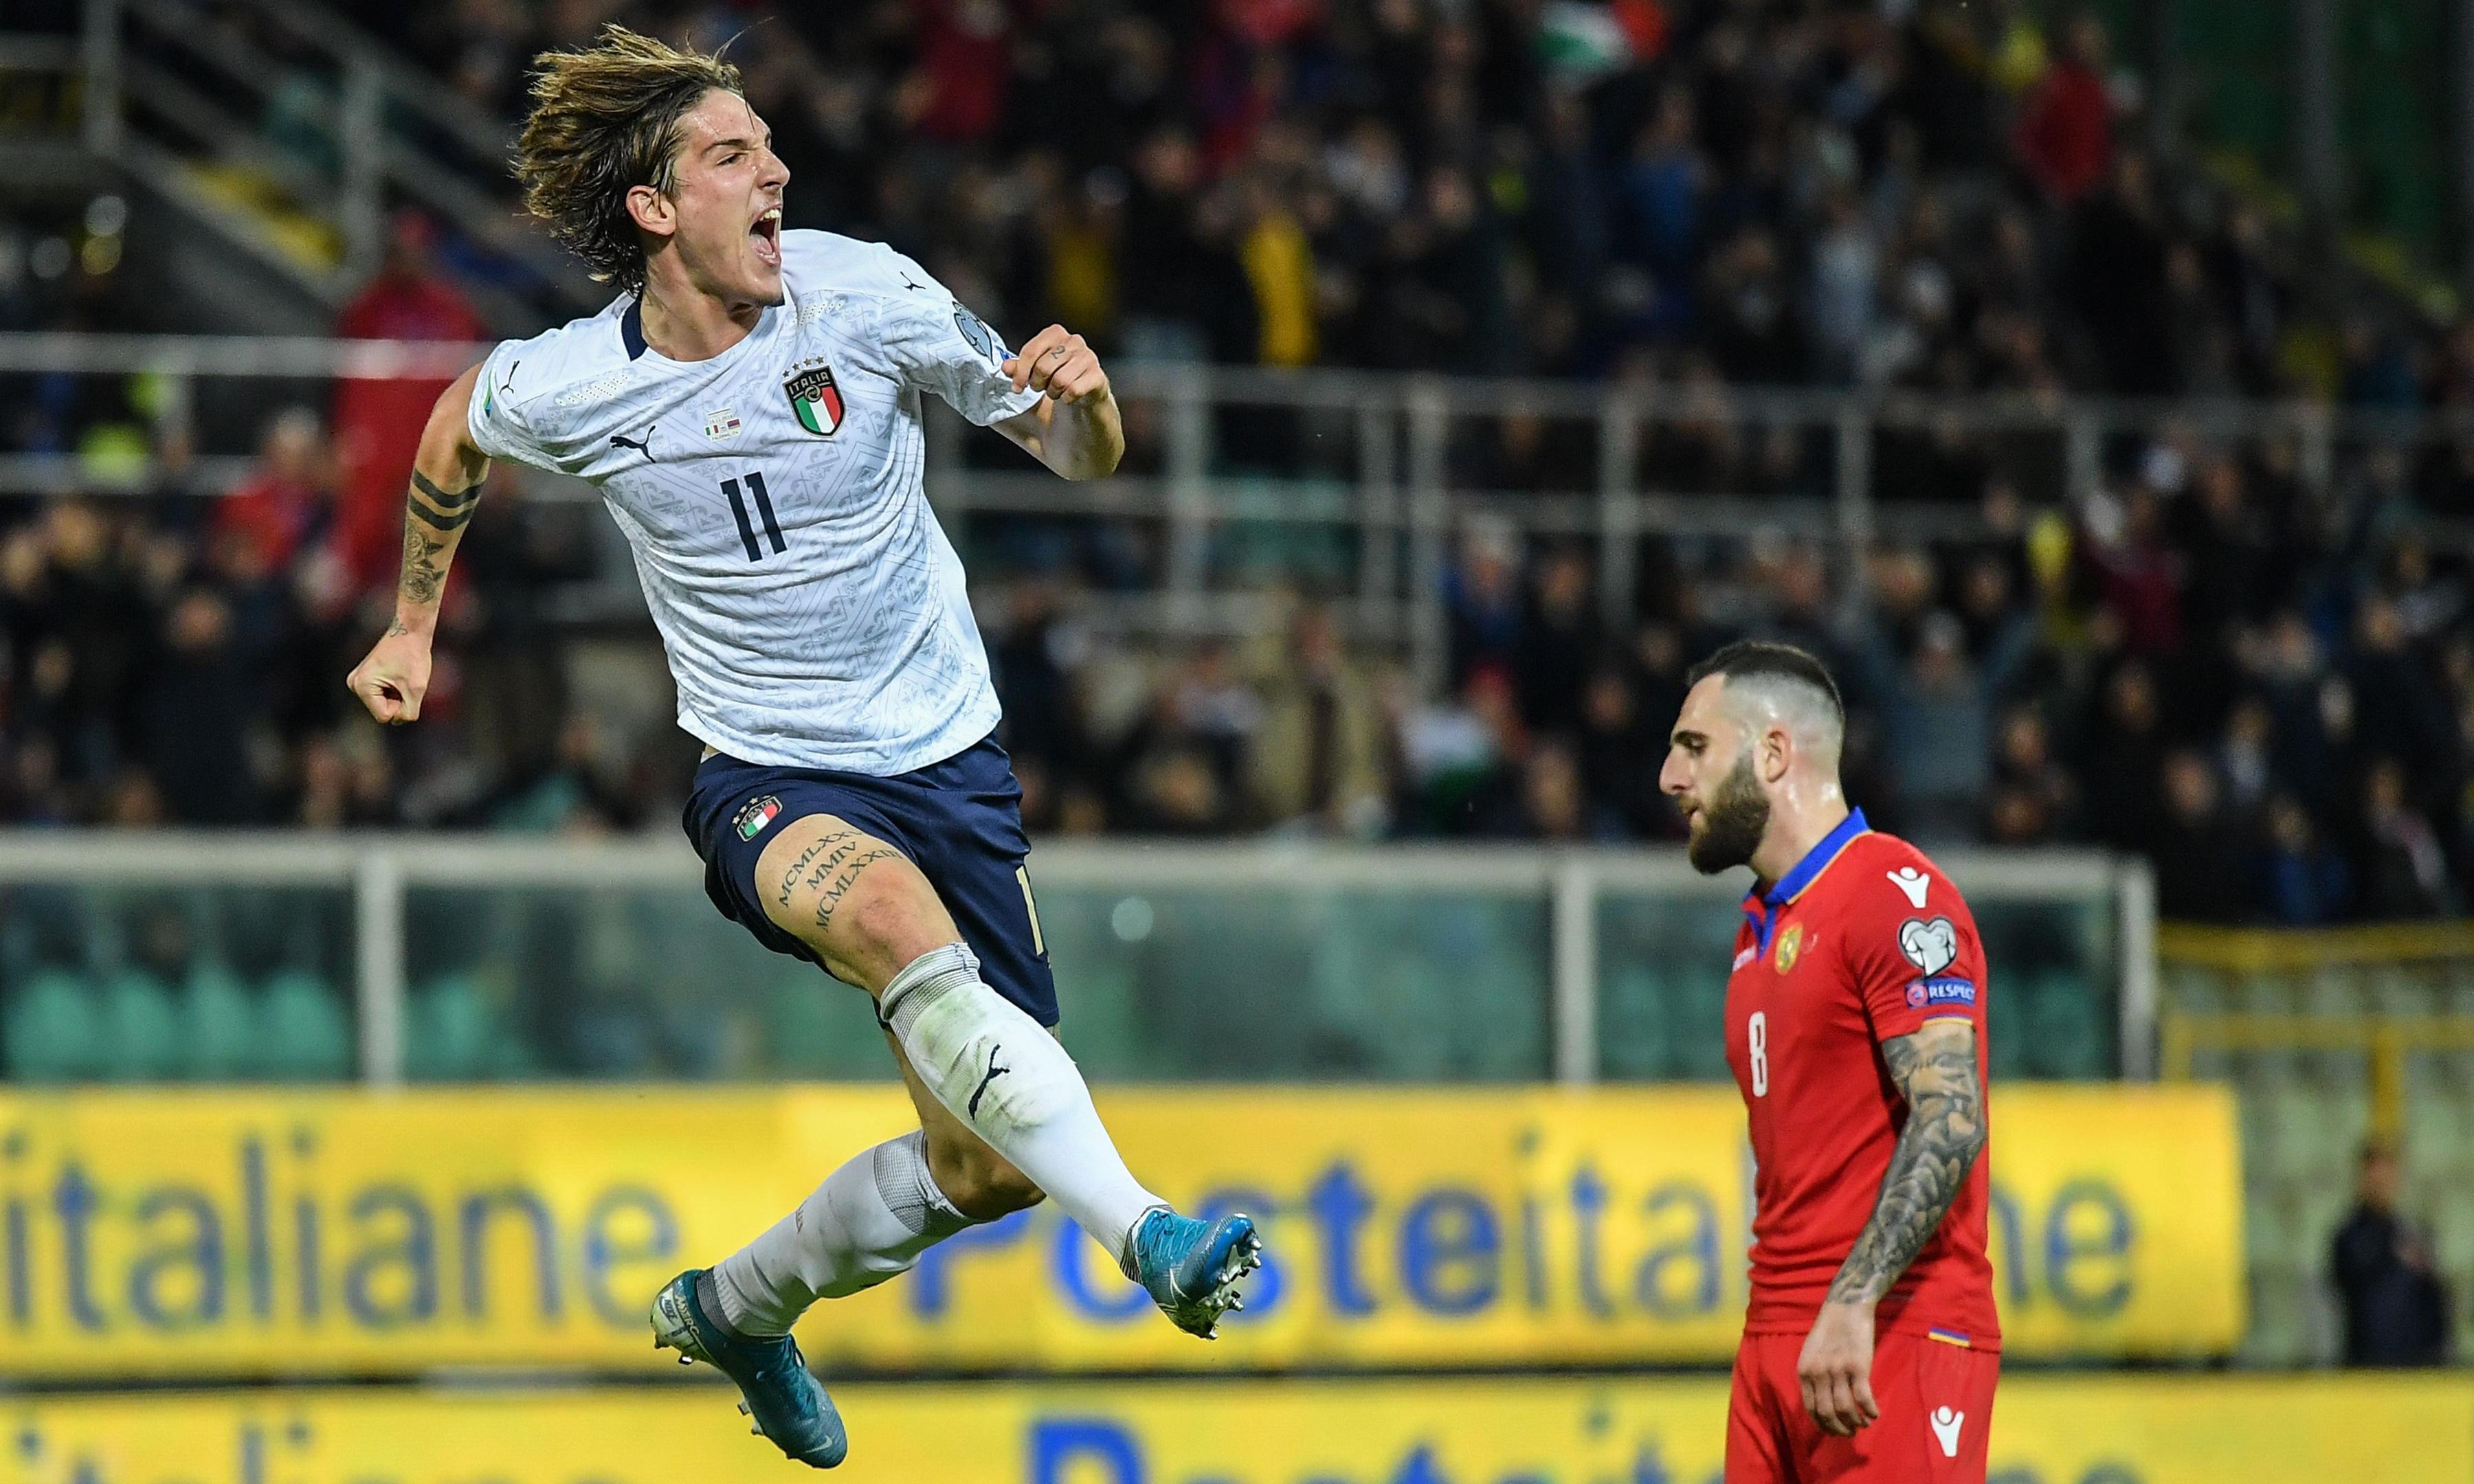 Euro 2020 roundup: Italy crush Armenia 9-1 while Spain hammer Romania